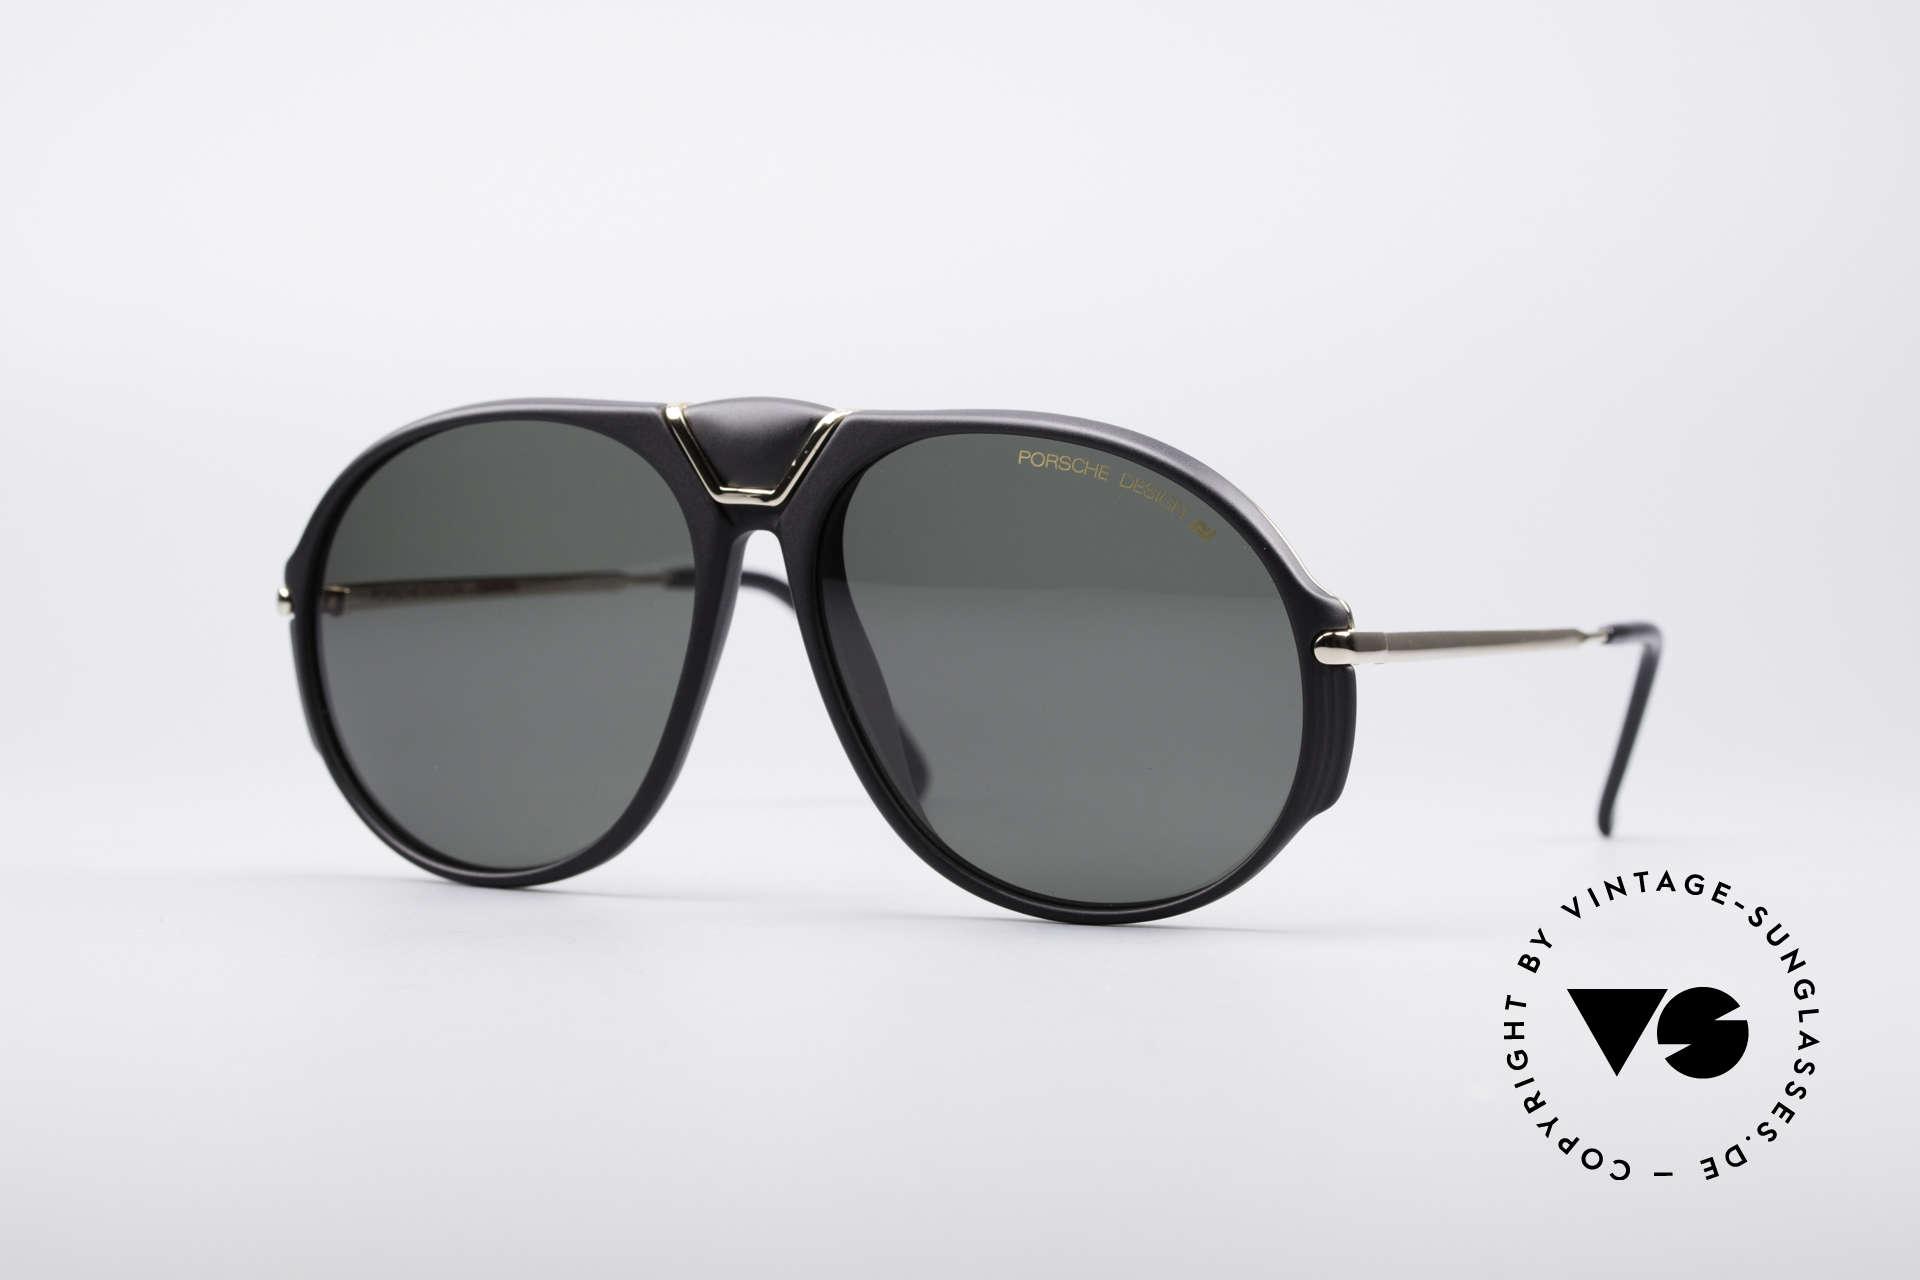 Porsche 5659 Interchangeable Shades S, rare vintage Porsche Carrera Design sunglasses, Made for Men and Women